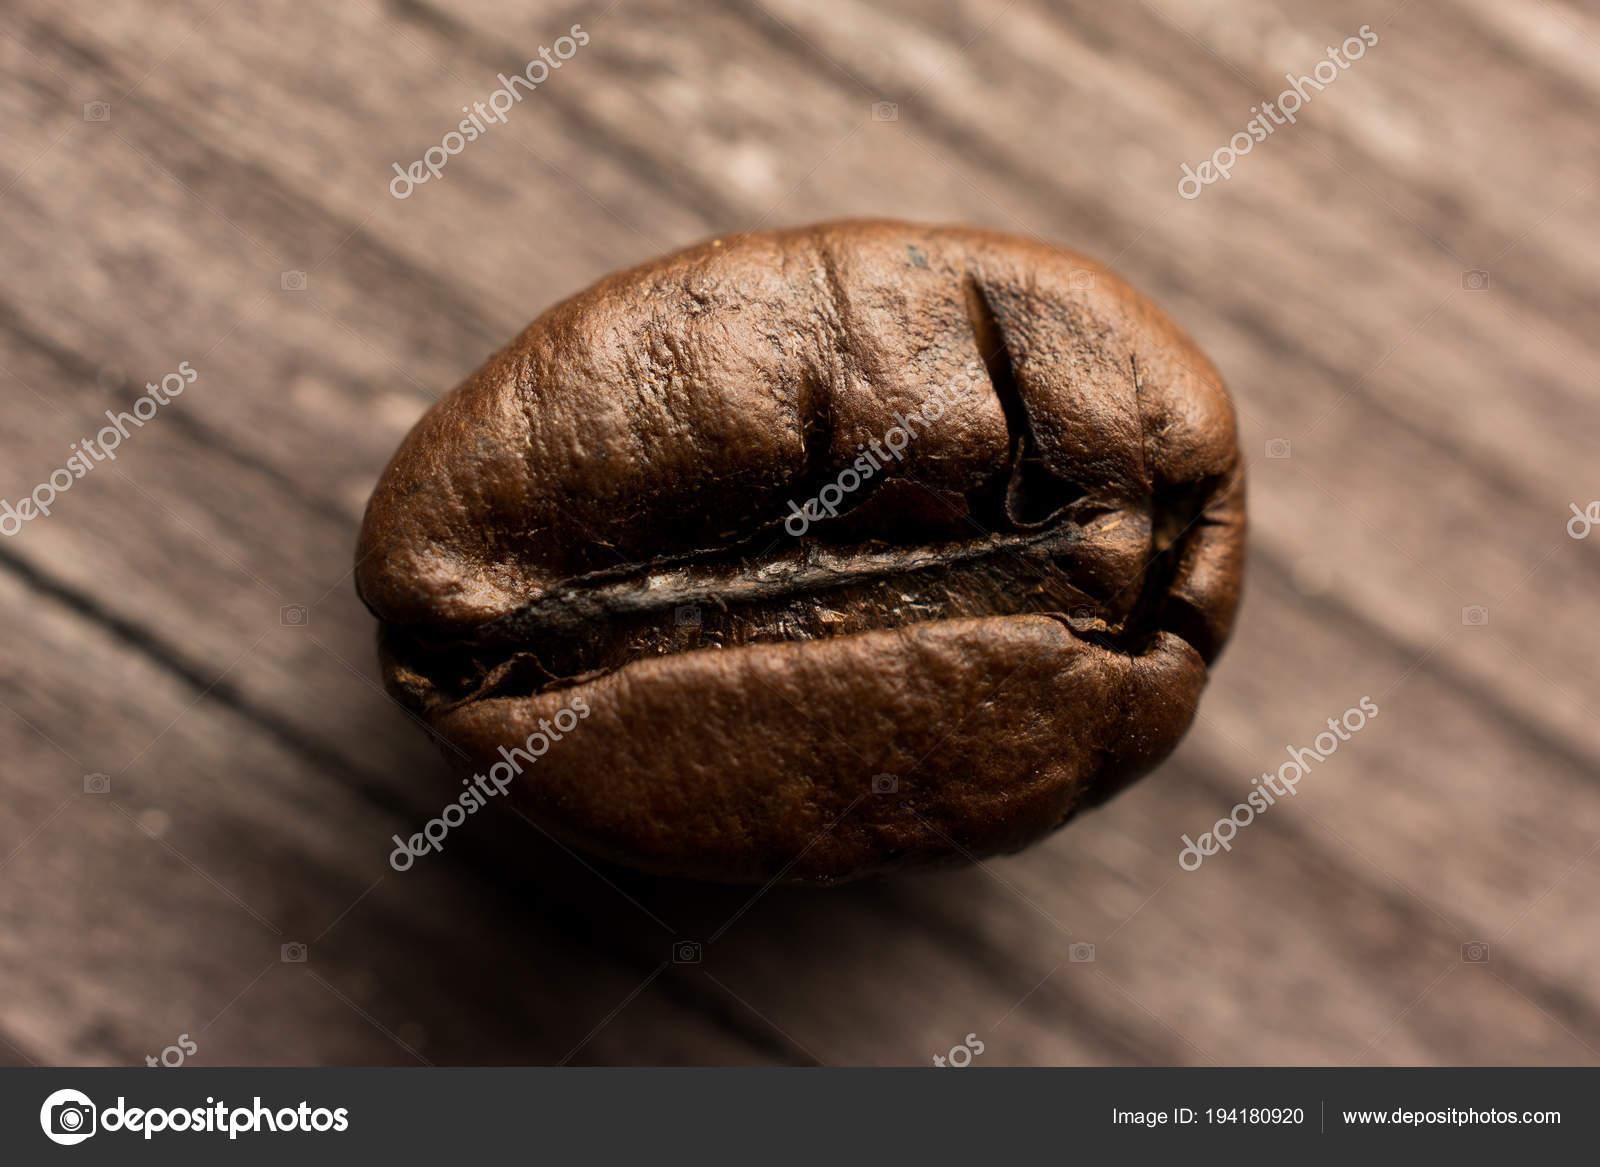 One Coffee Bean On Wooden Board Closeup Stock Photo